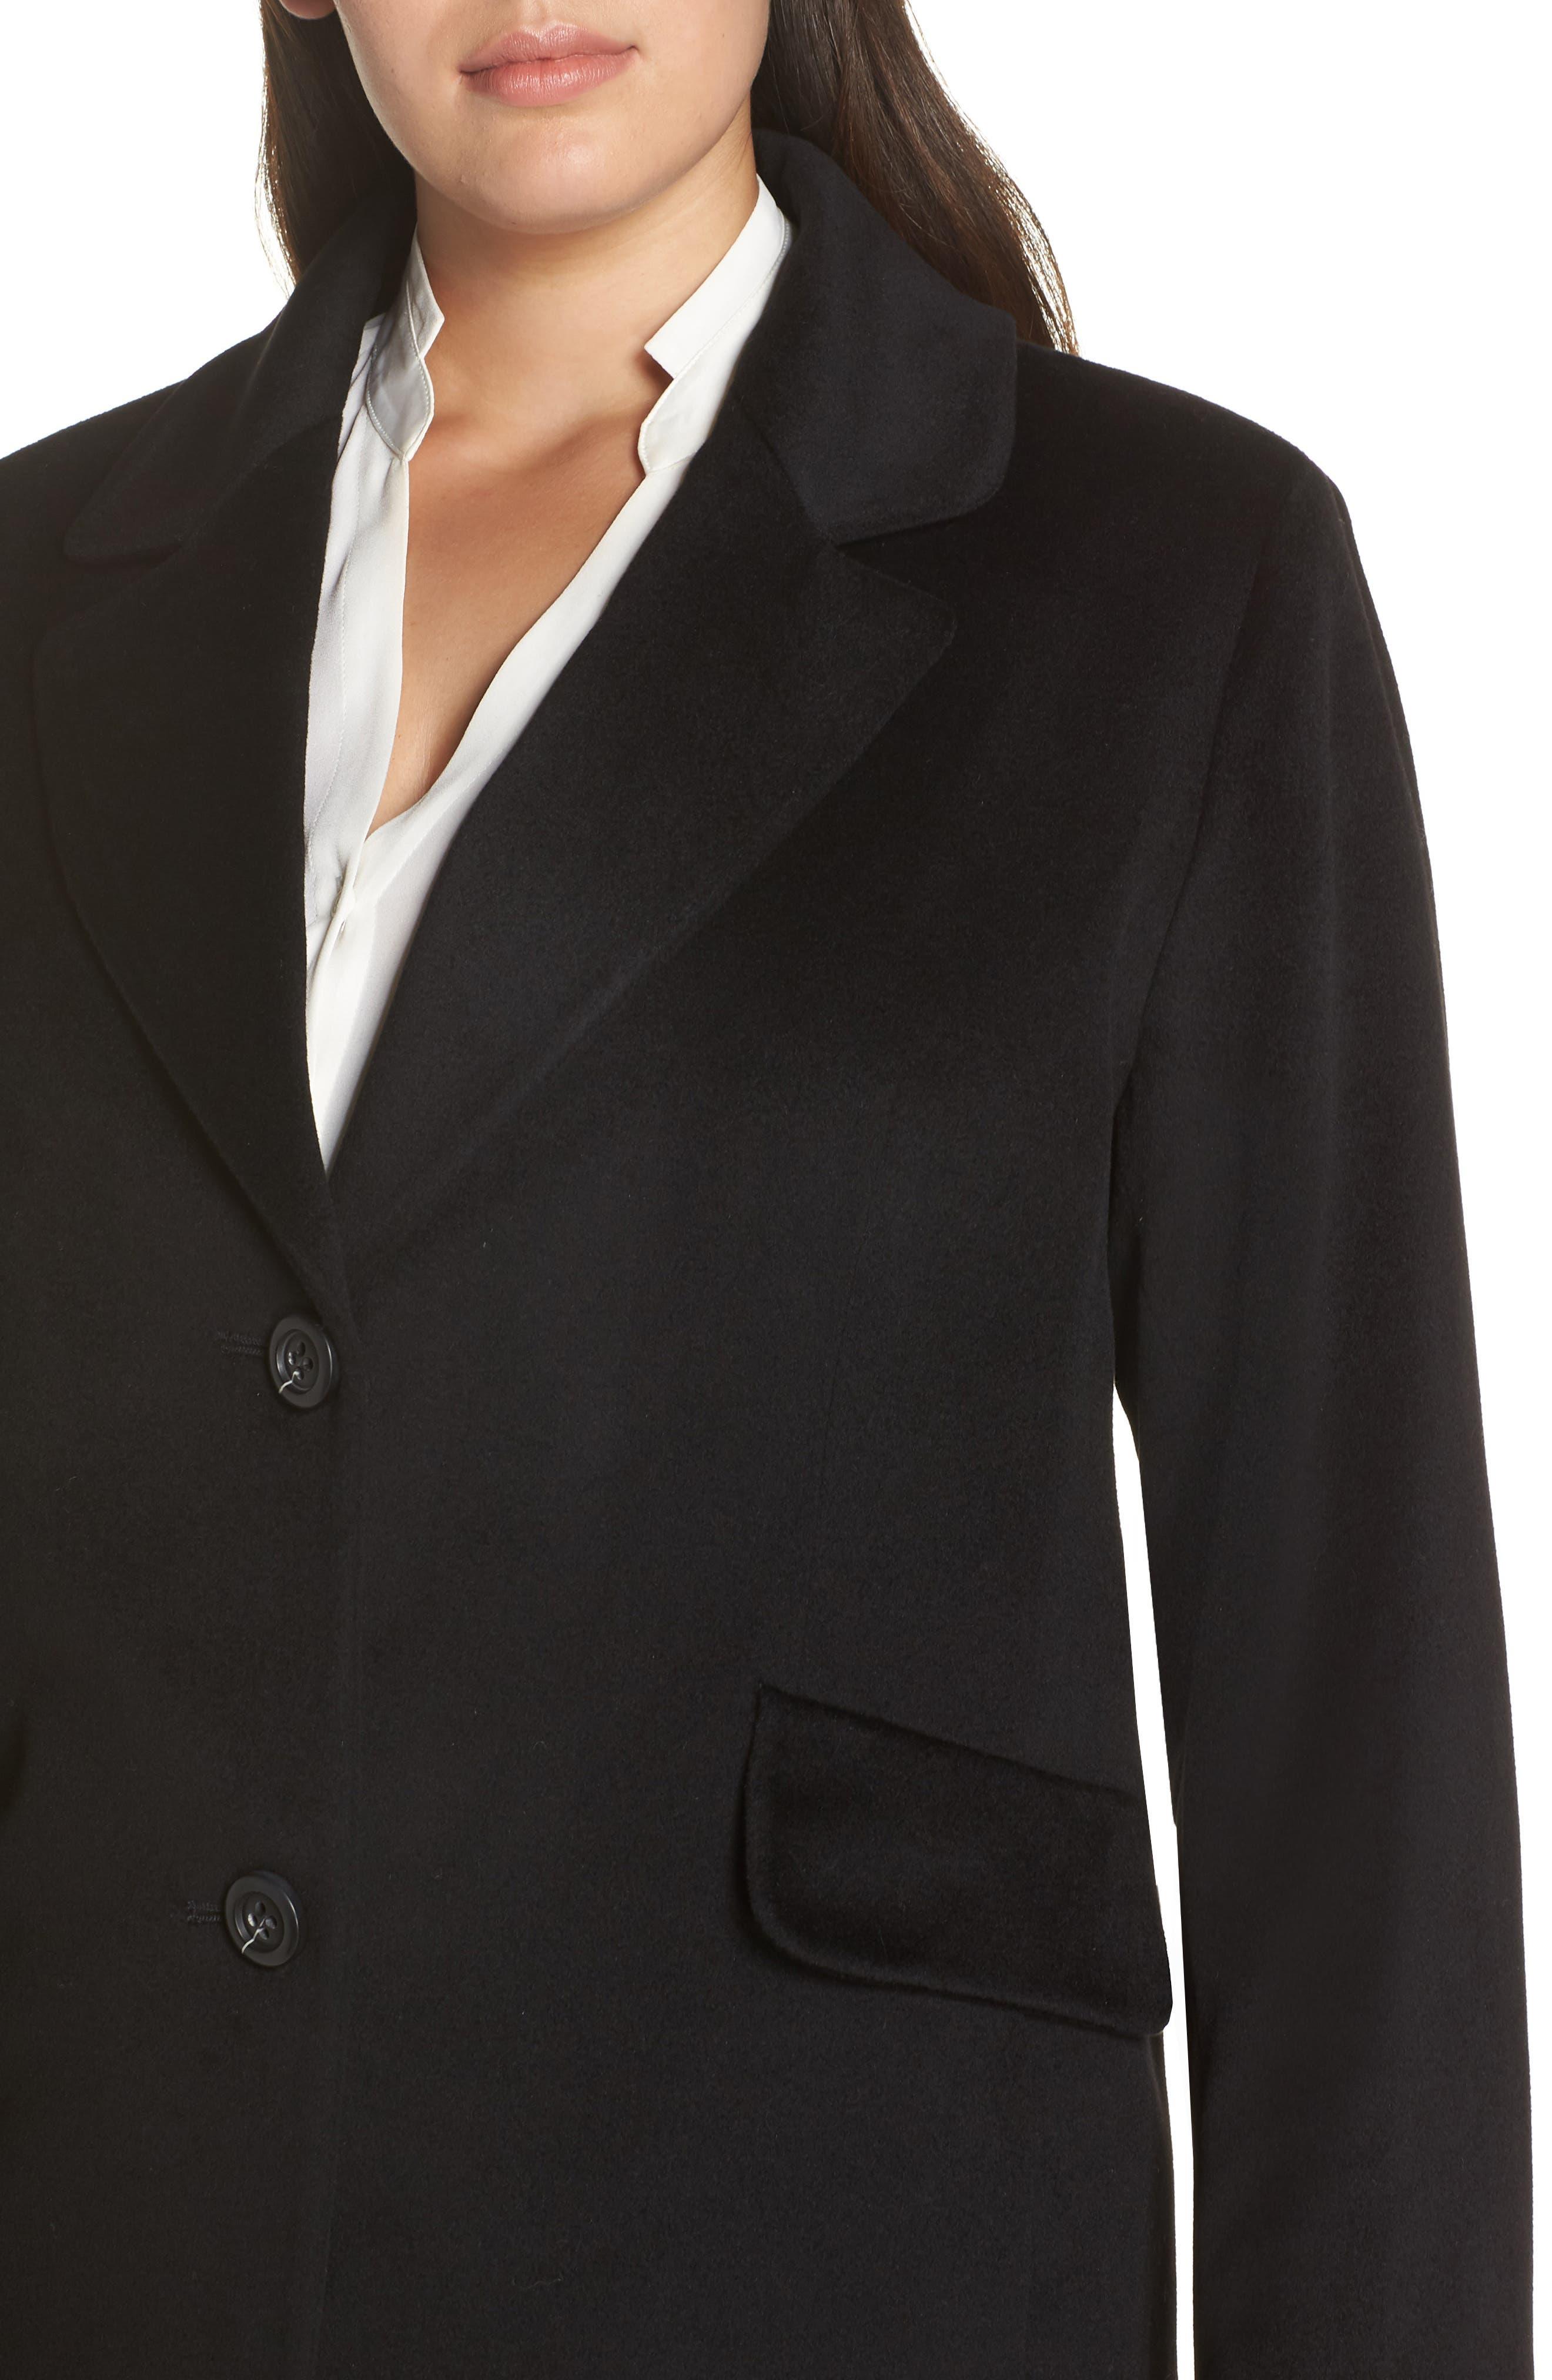 FLEURETTE, Notch Collar Loro Piana Wool Coat, Alternate thumbnail 5, color, BLACK